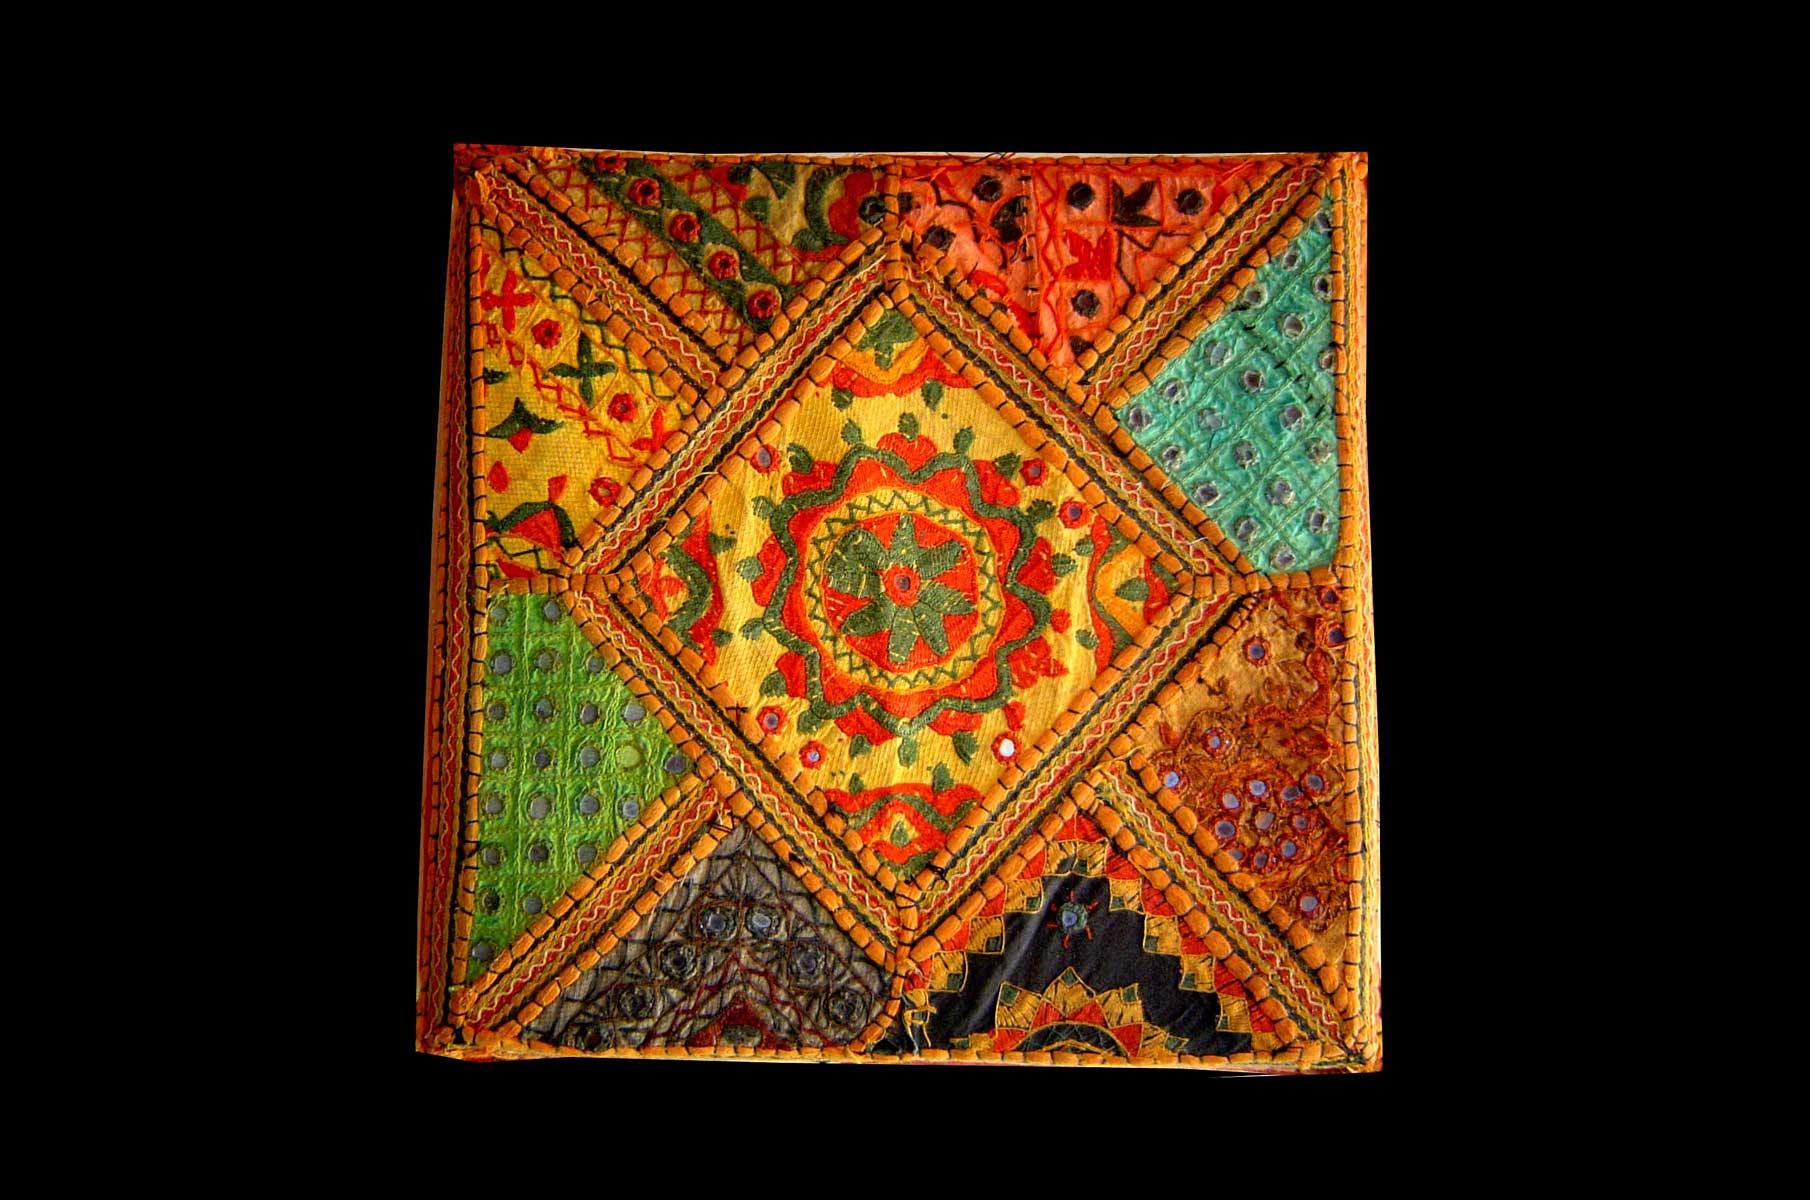 Kashmir Artizan Udaipur Cushion Covers Sofa Cushions  : 14 from indianpurepashmina.com size 1810 x 1200 jpeg 226kB